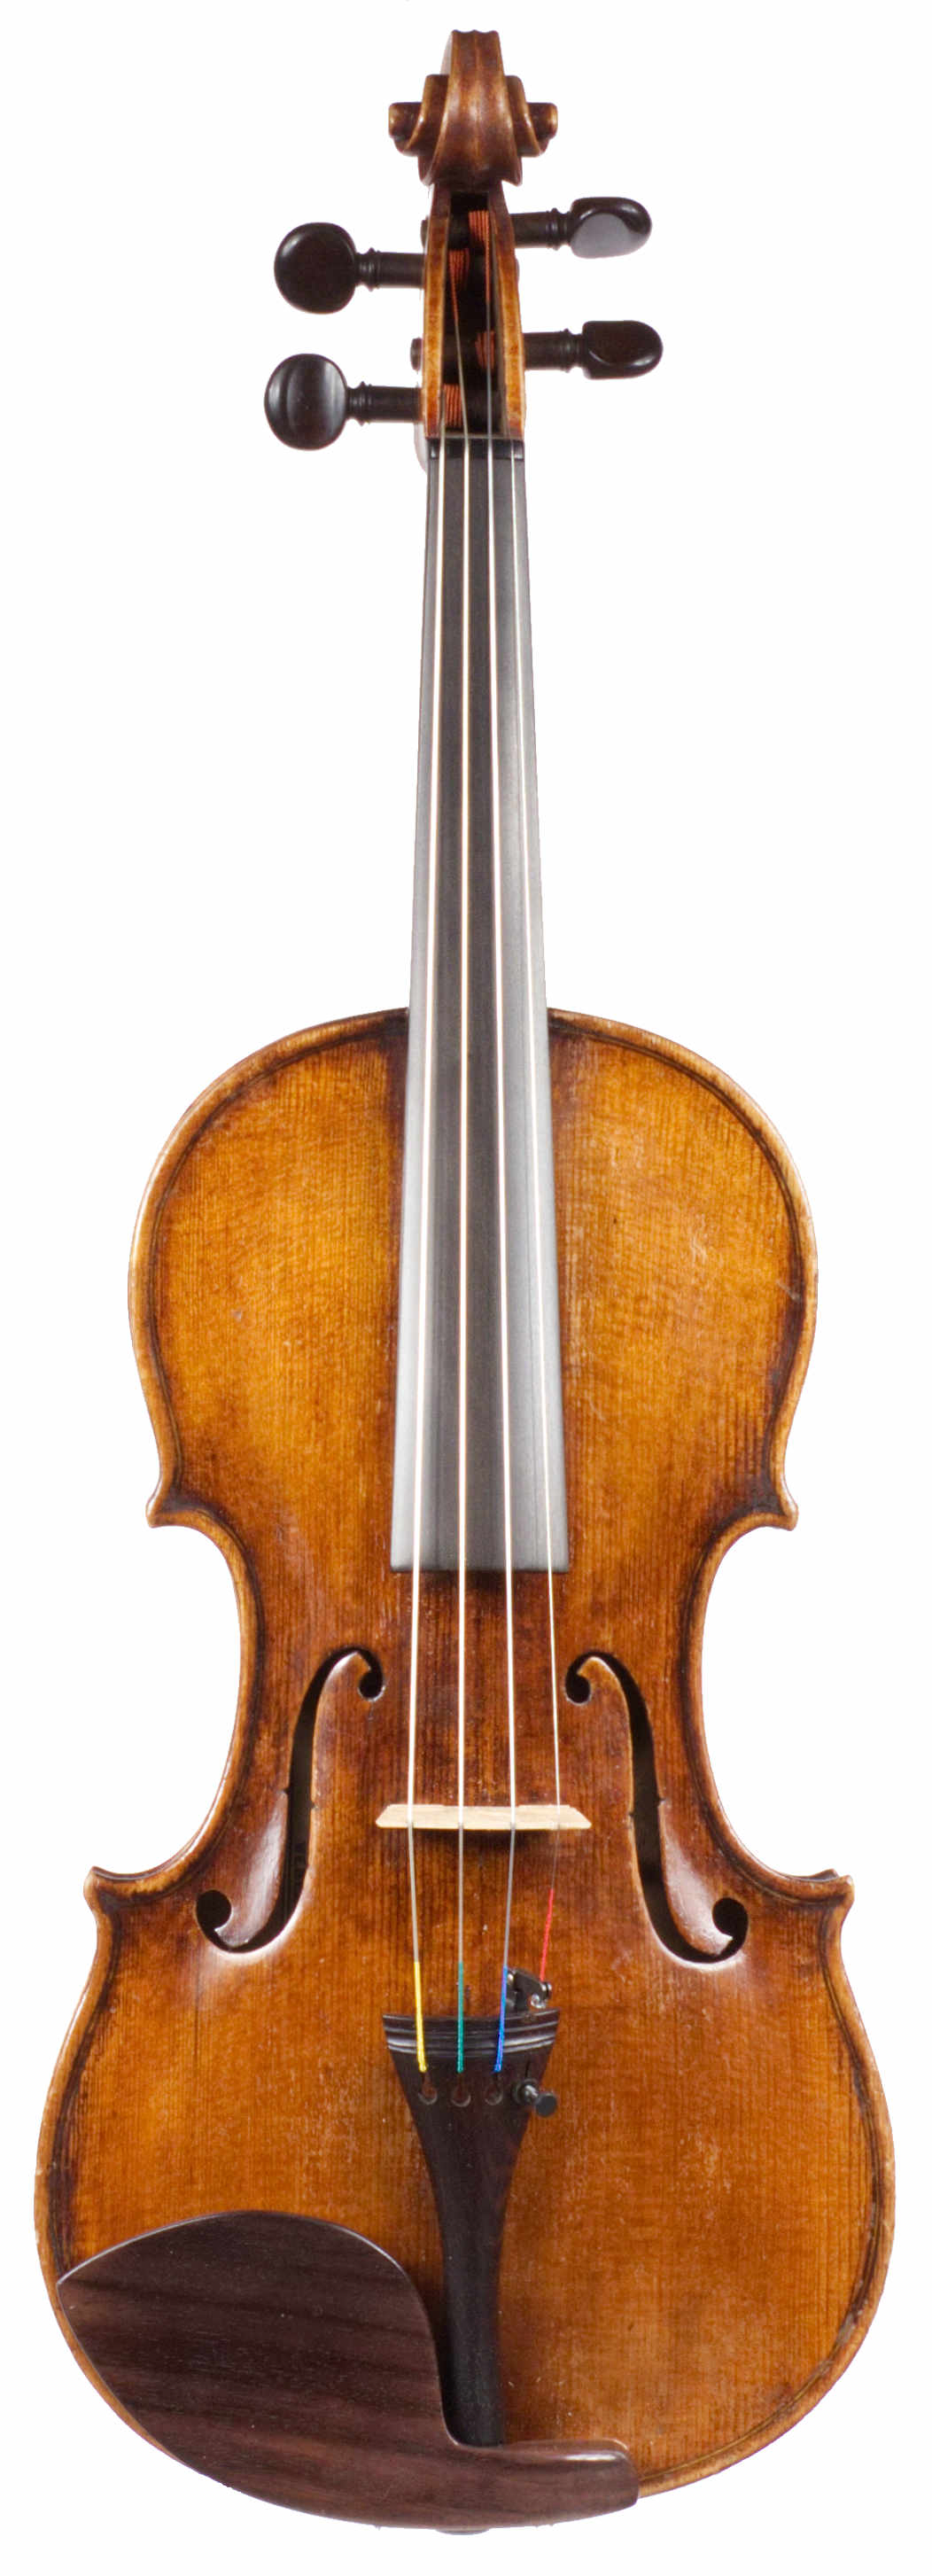 Degani violin